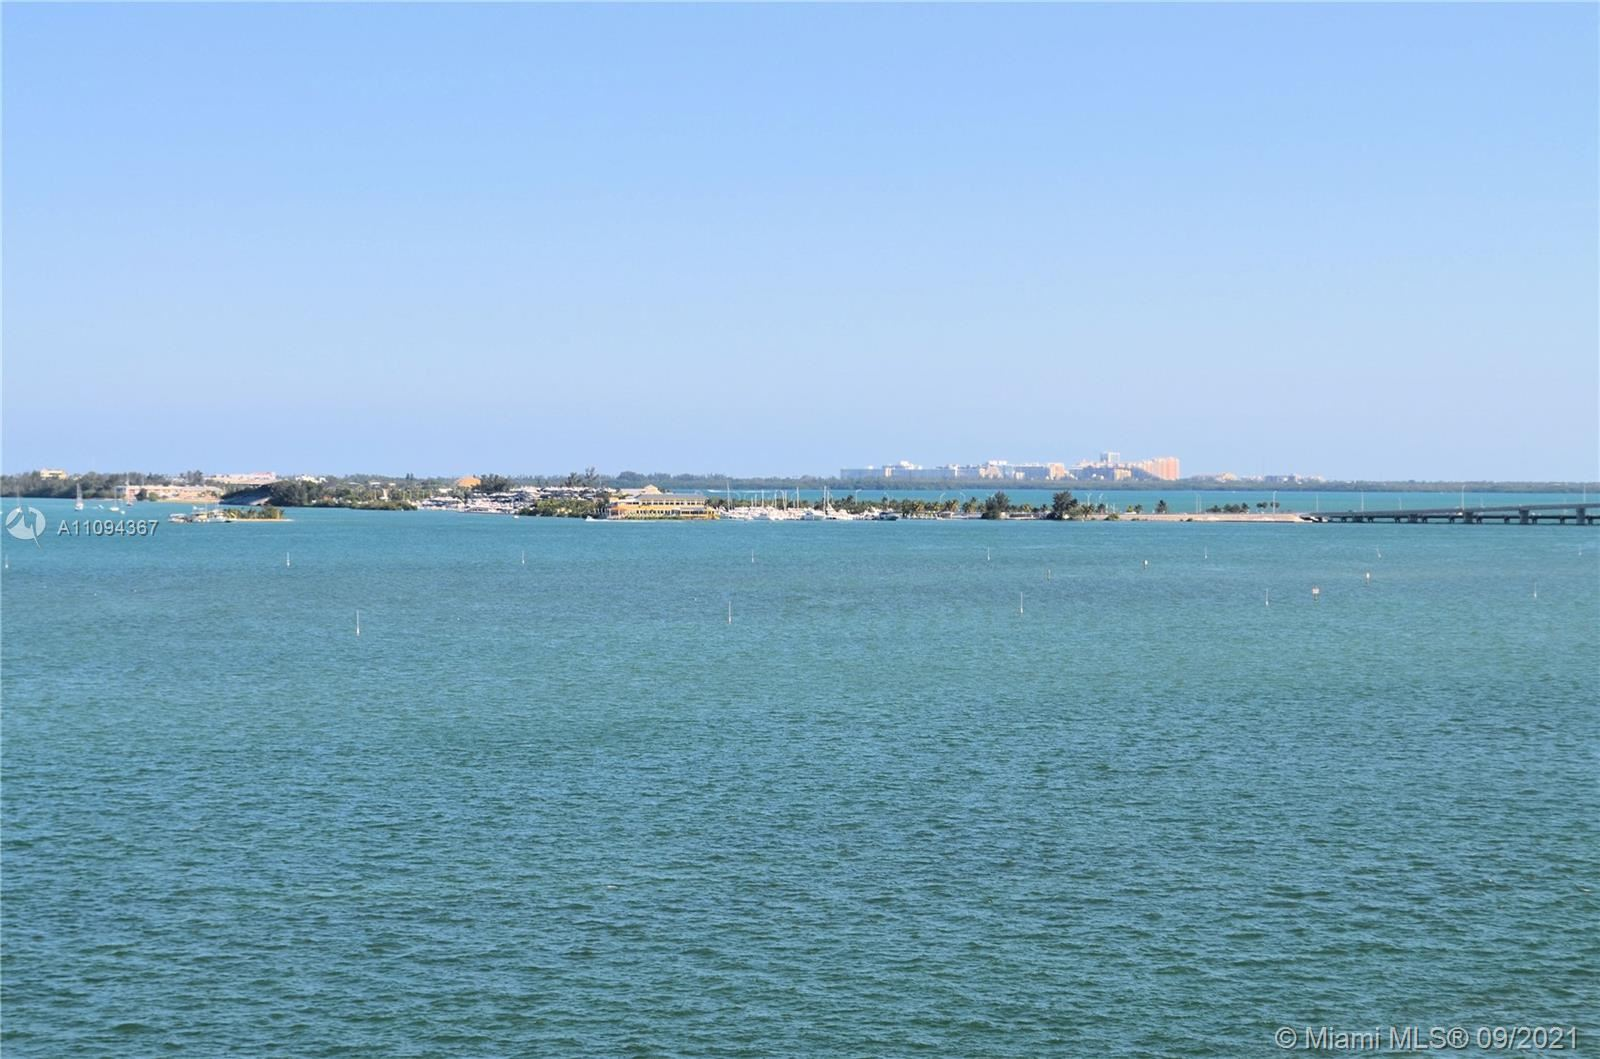 800 Claughton Island Dr #904, Miami, FL 33131 - #: A11094367